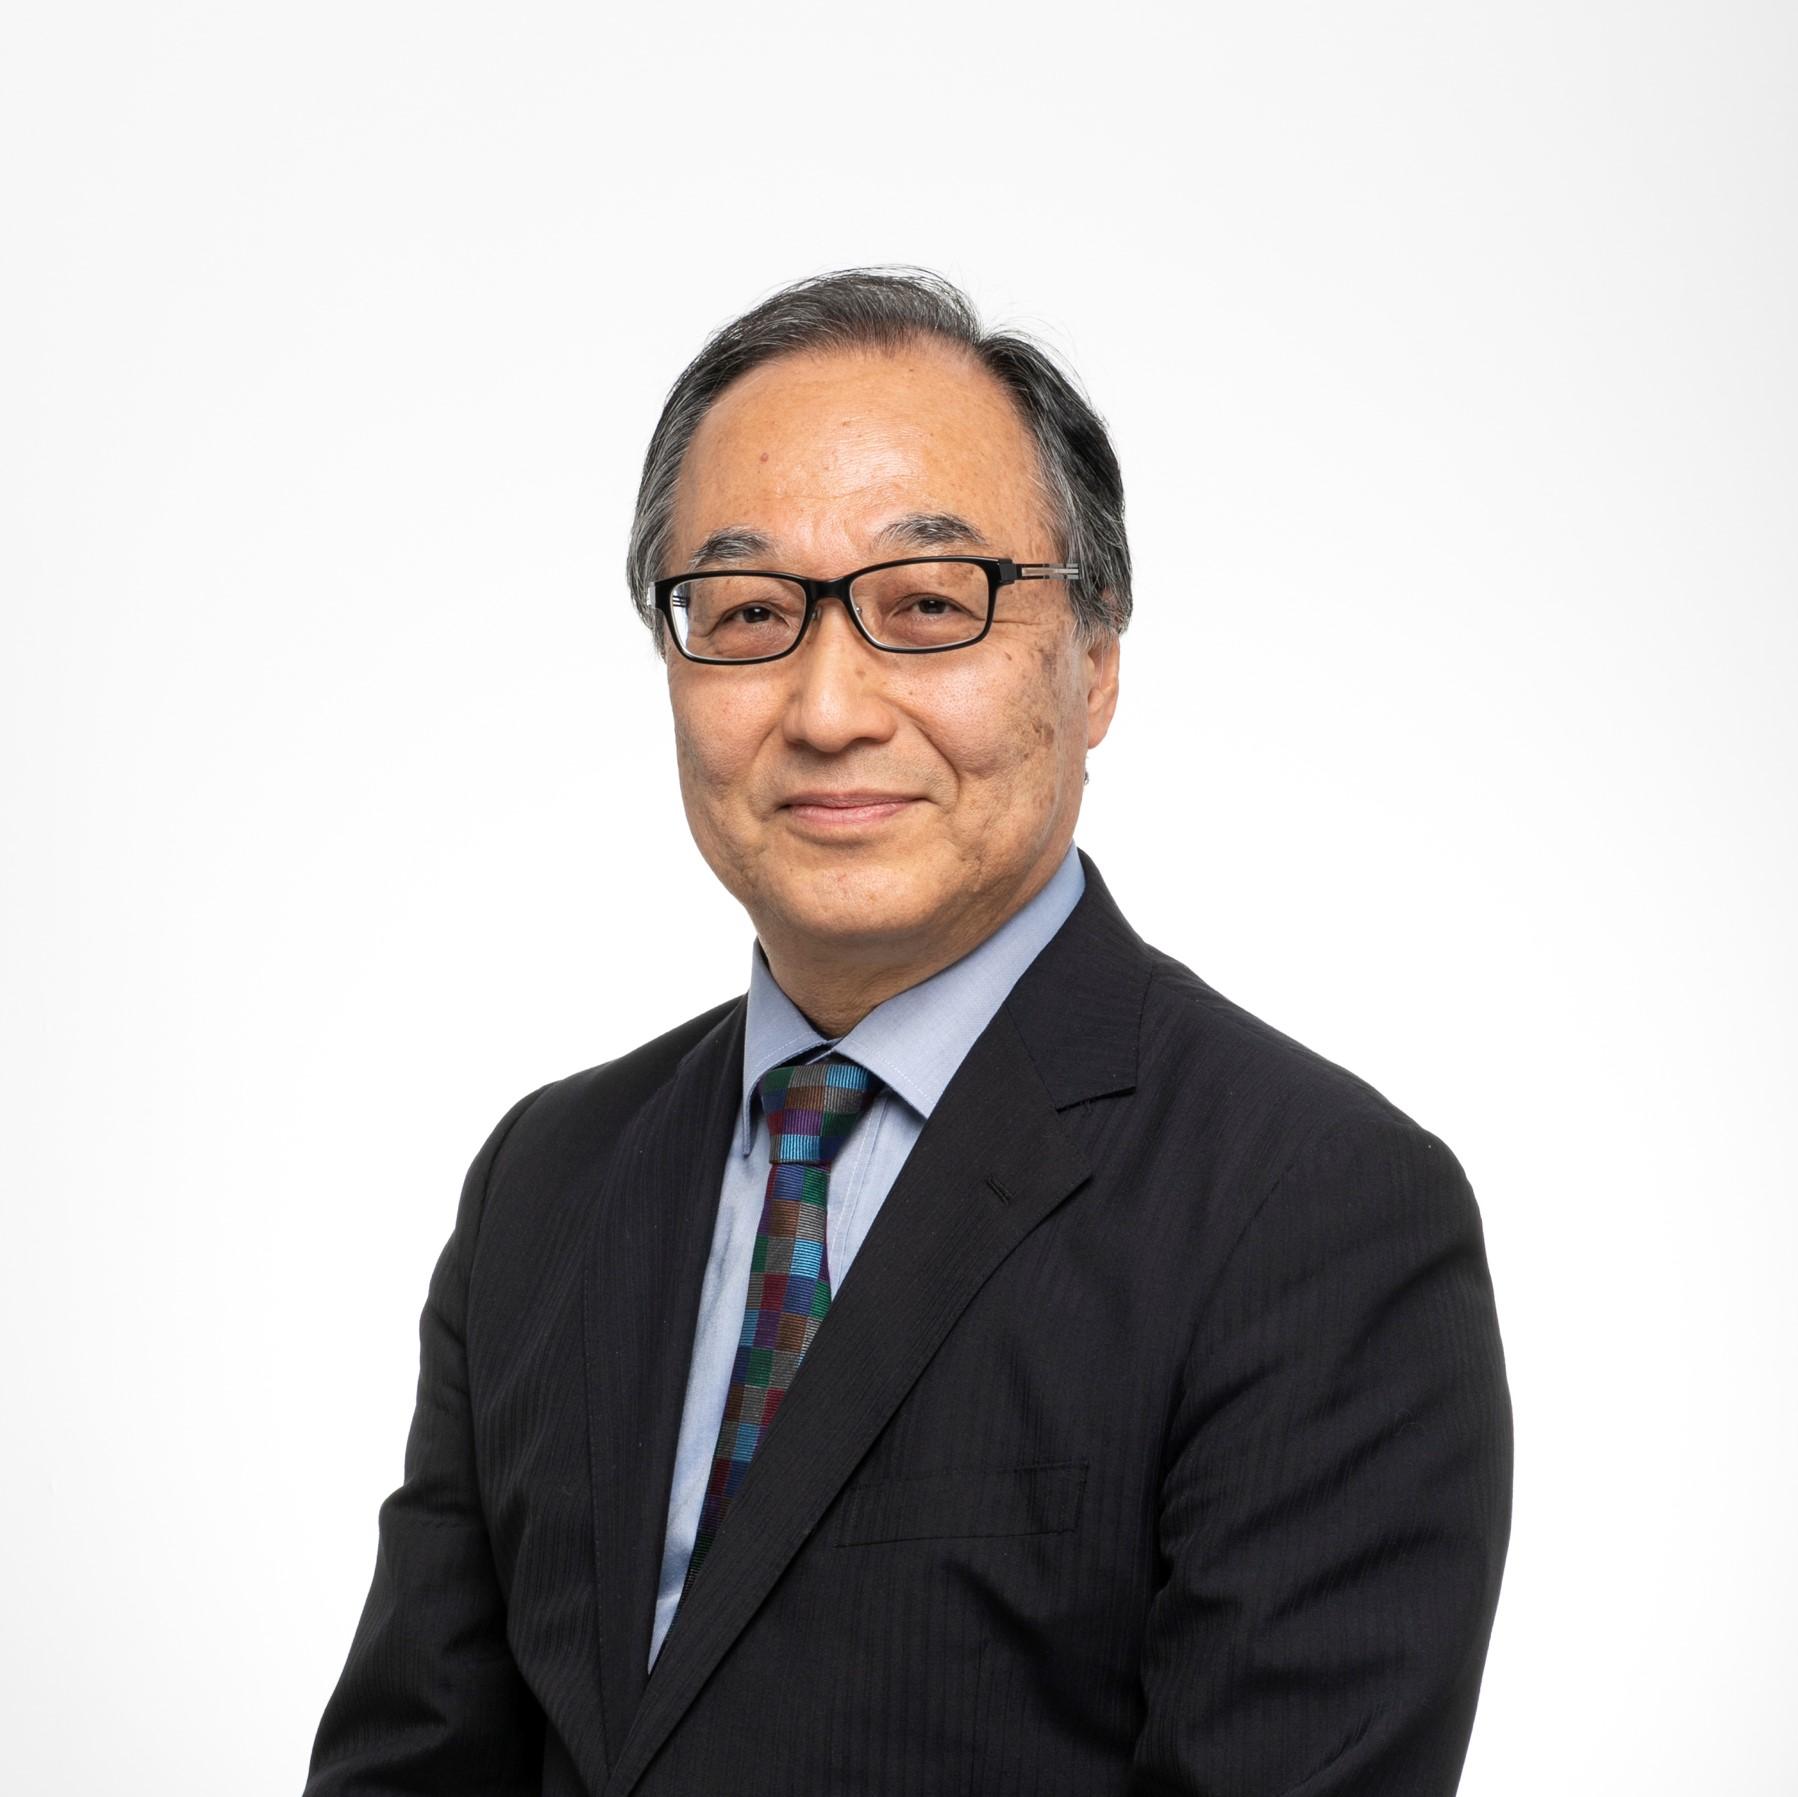 Shigeo Nomoto